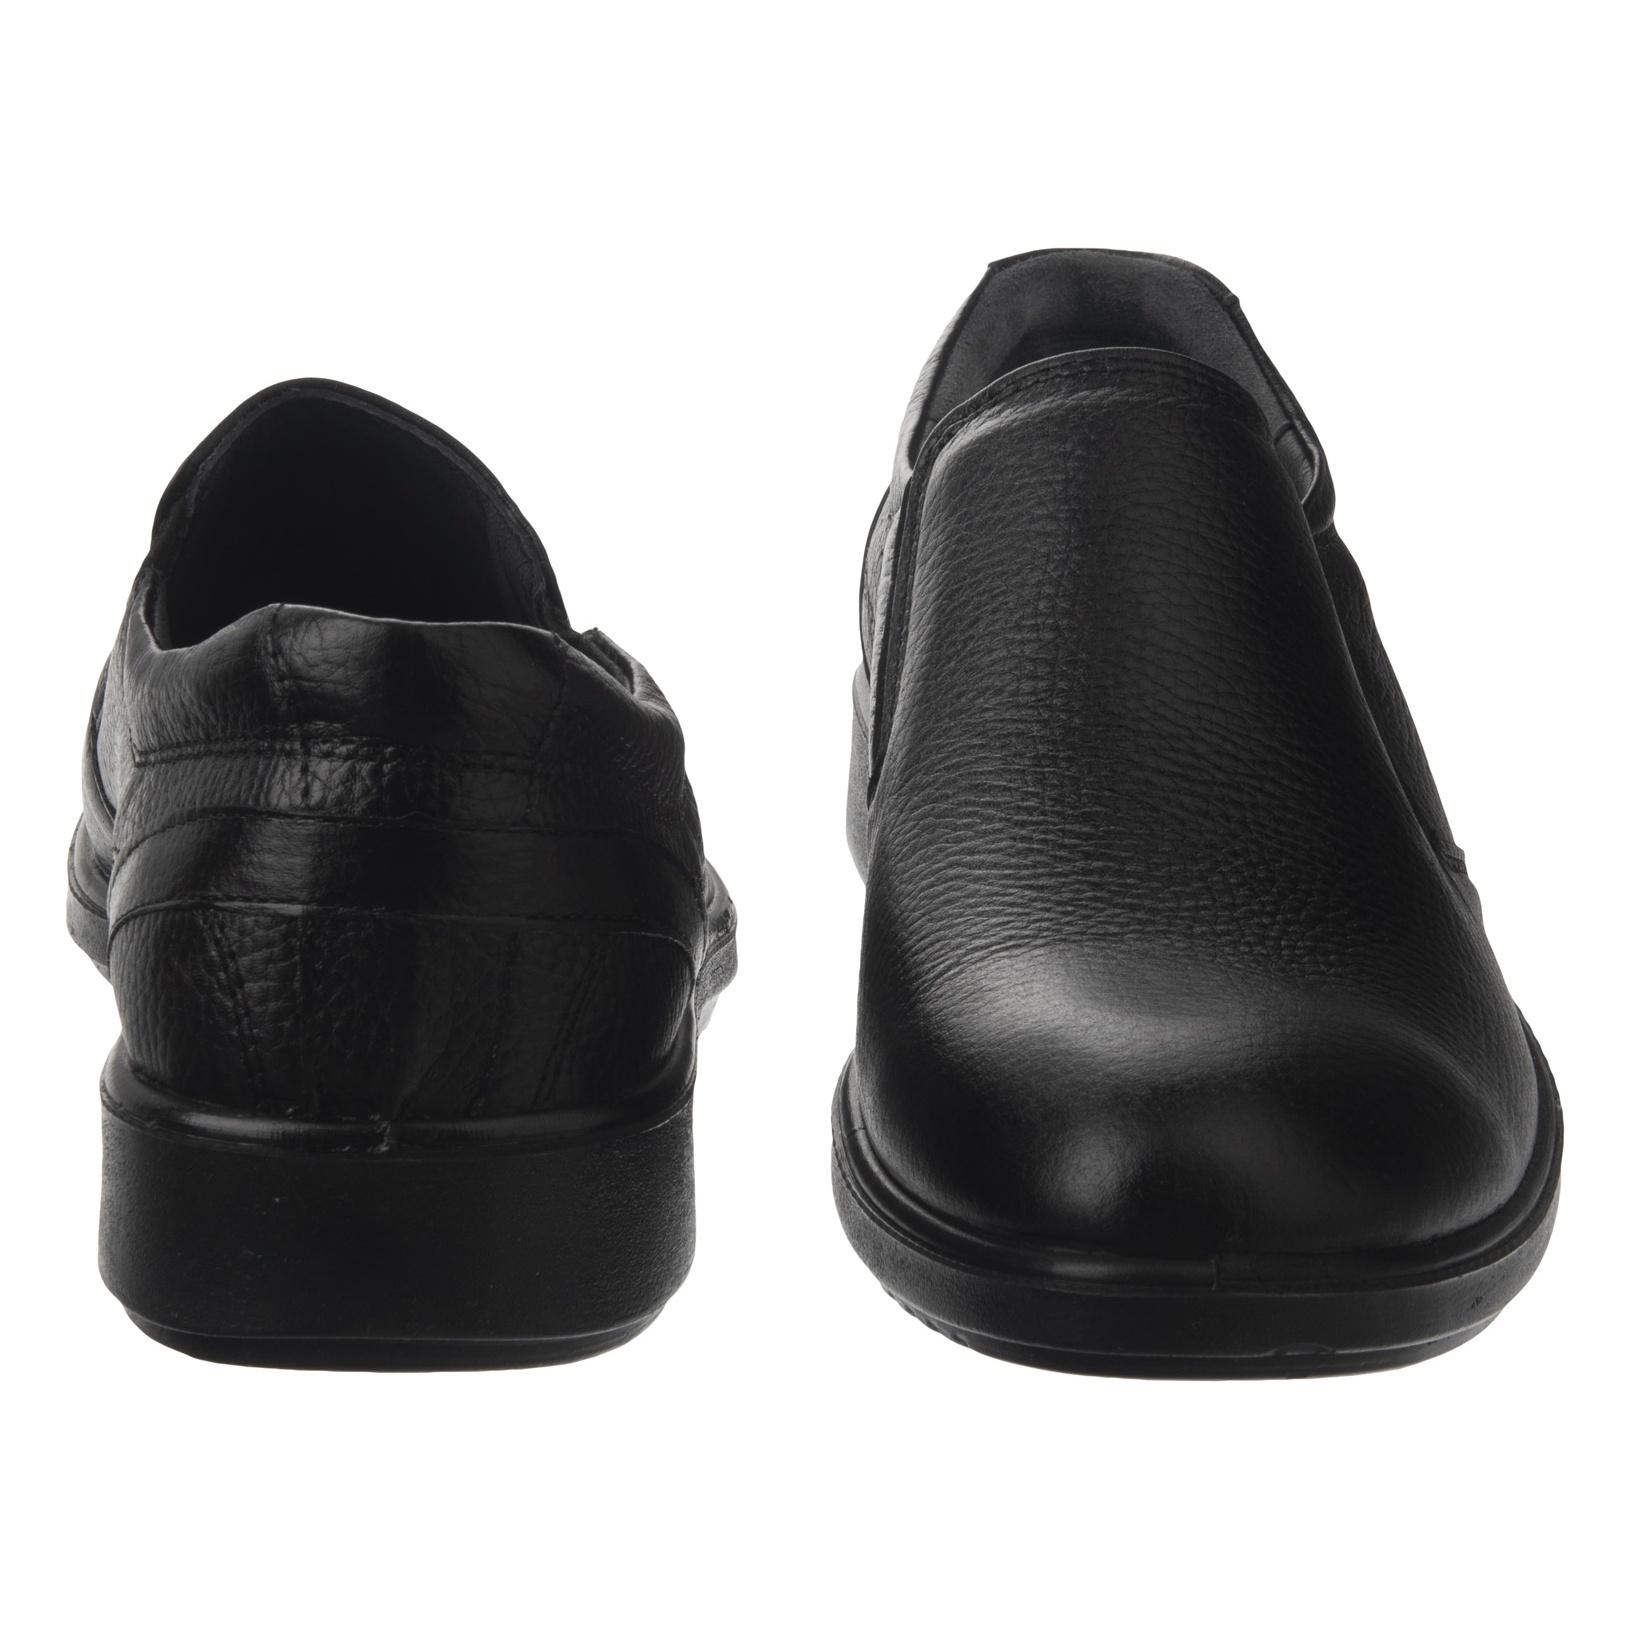 کفش روزمره مردانه شیفر مدل 7216A-101 - مشکی - 6